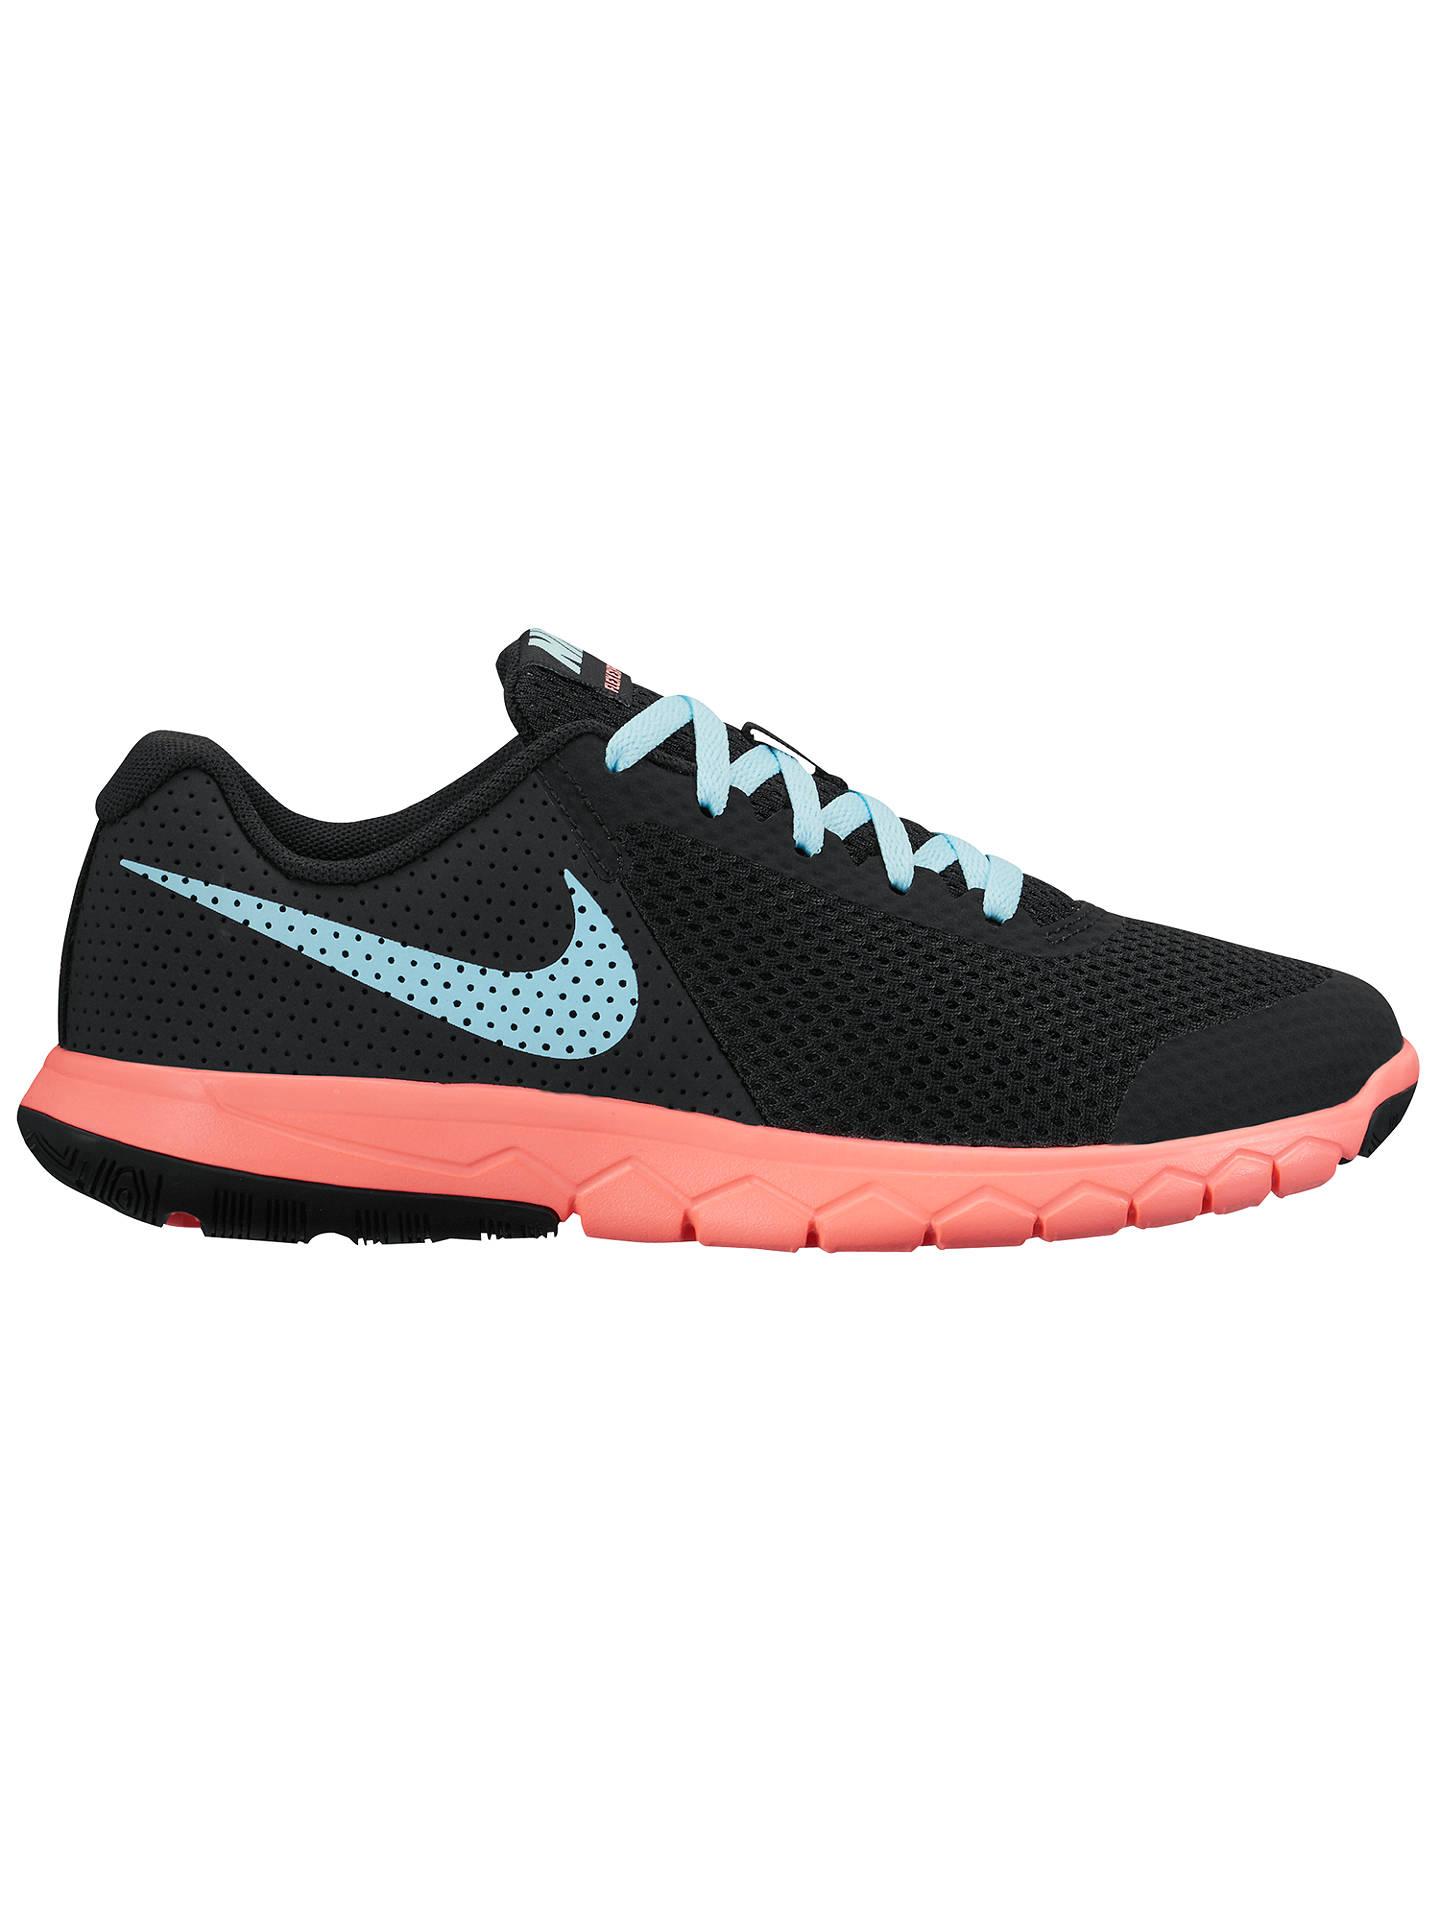 78b5e7e16b0ea Nike Children s Flex Experience 5 Laced Trainers at John Lewis ...